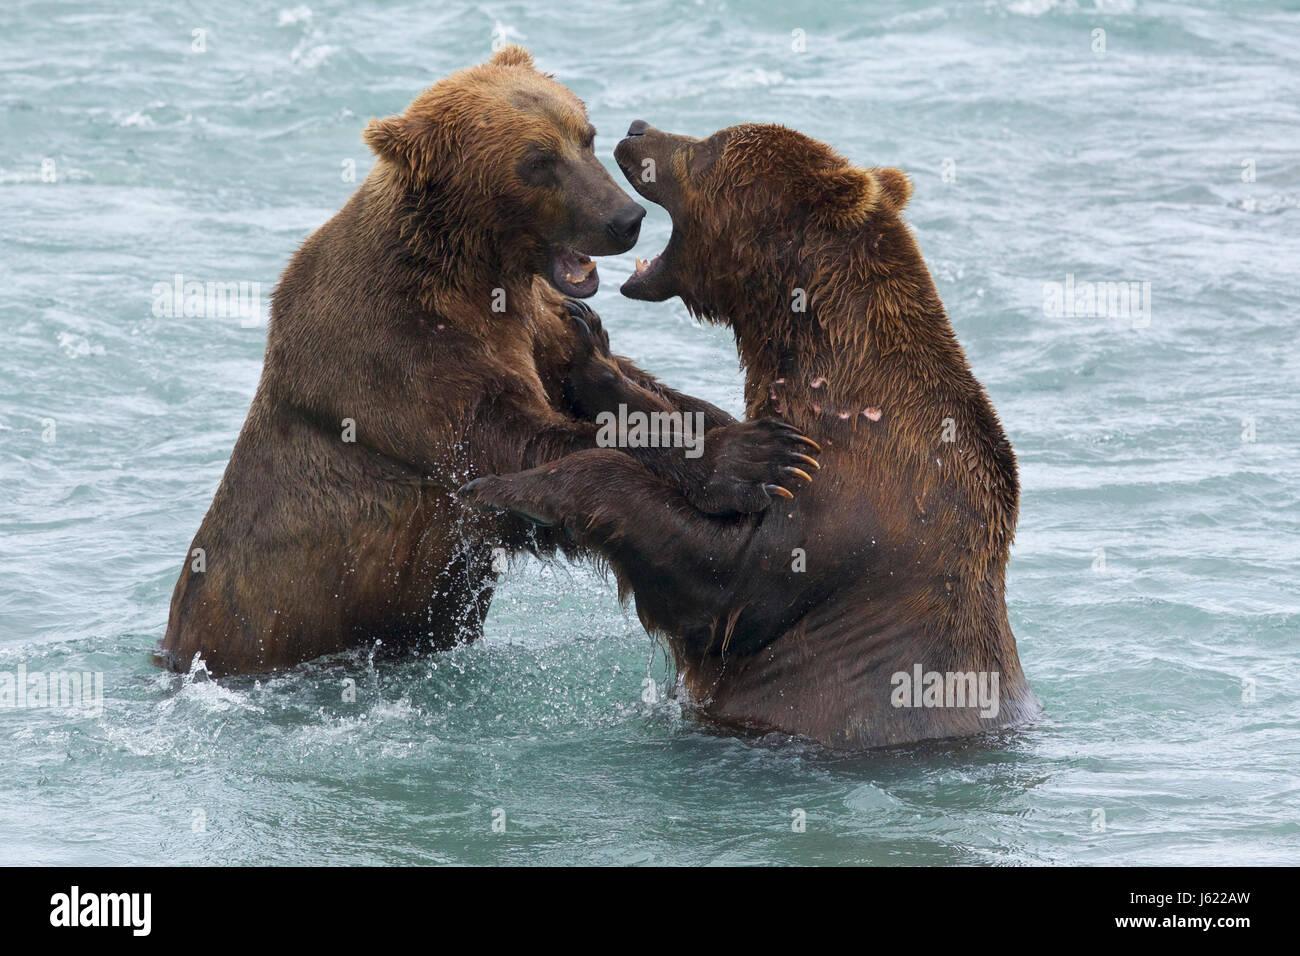 Ursus Arctos Alascensis Stock Photos & Ursus Arctos ...